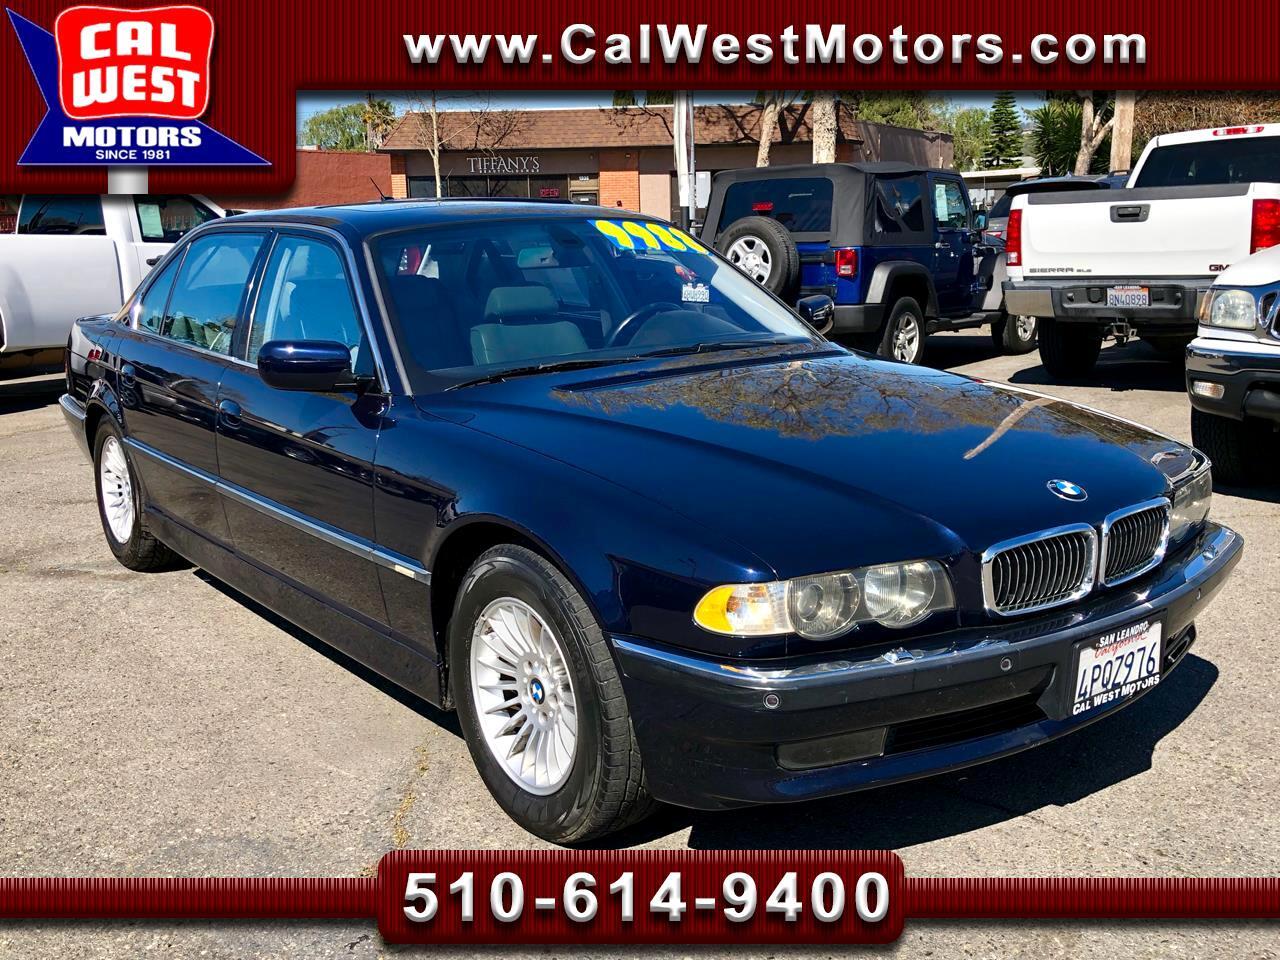 2001 BMW 7-Series 750iL NAV LowMiles VeryClean GreatMtnceHist